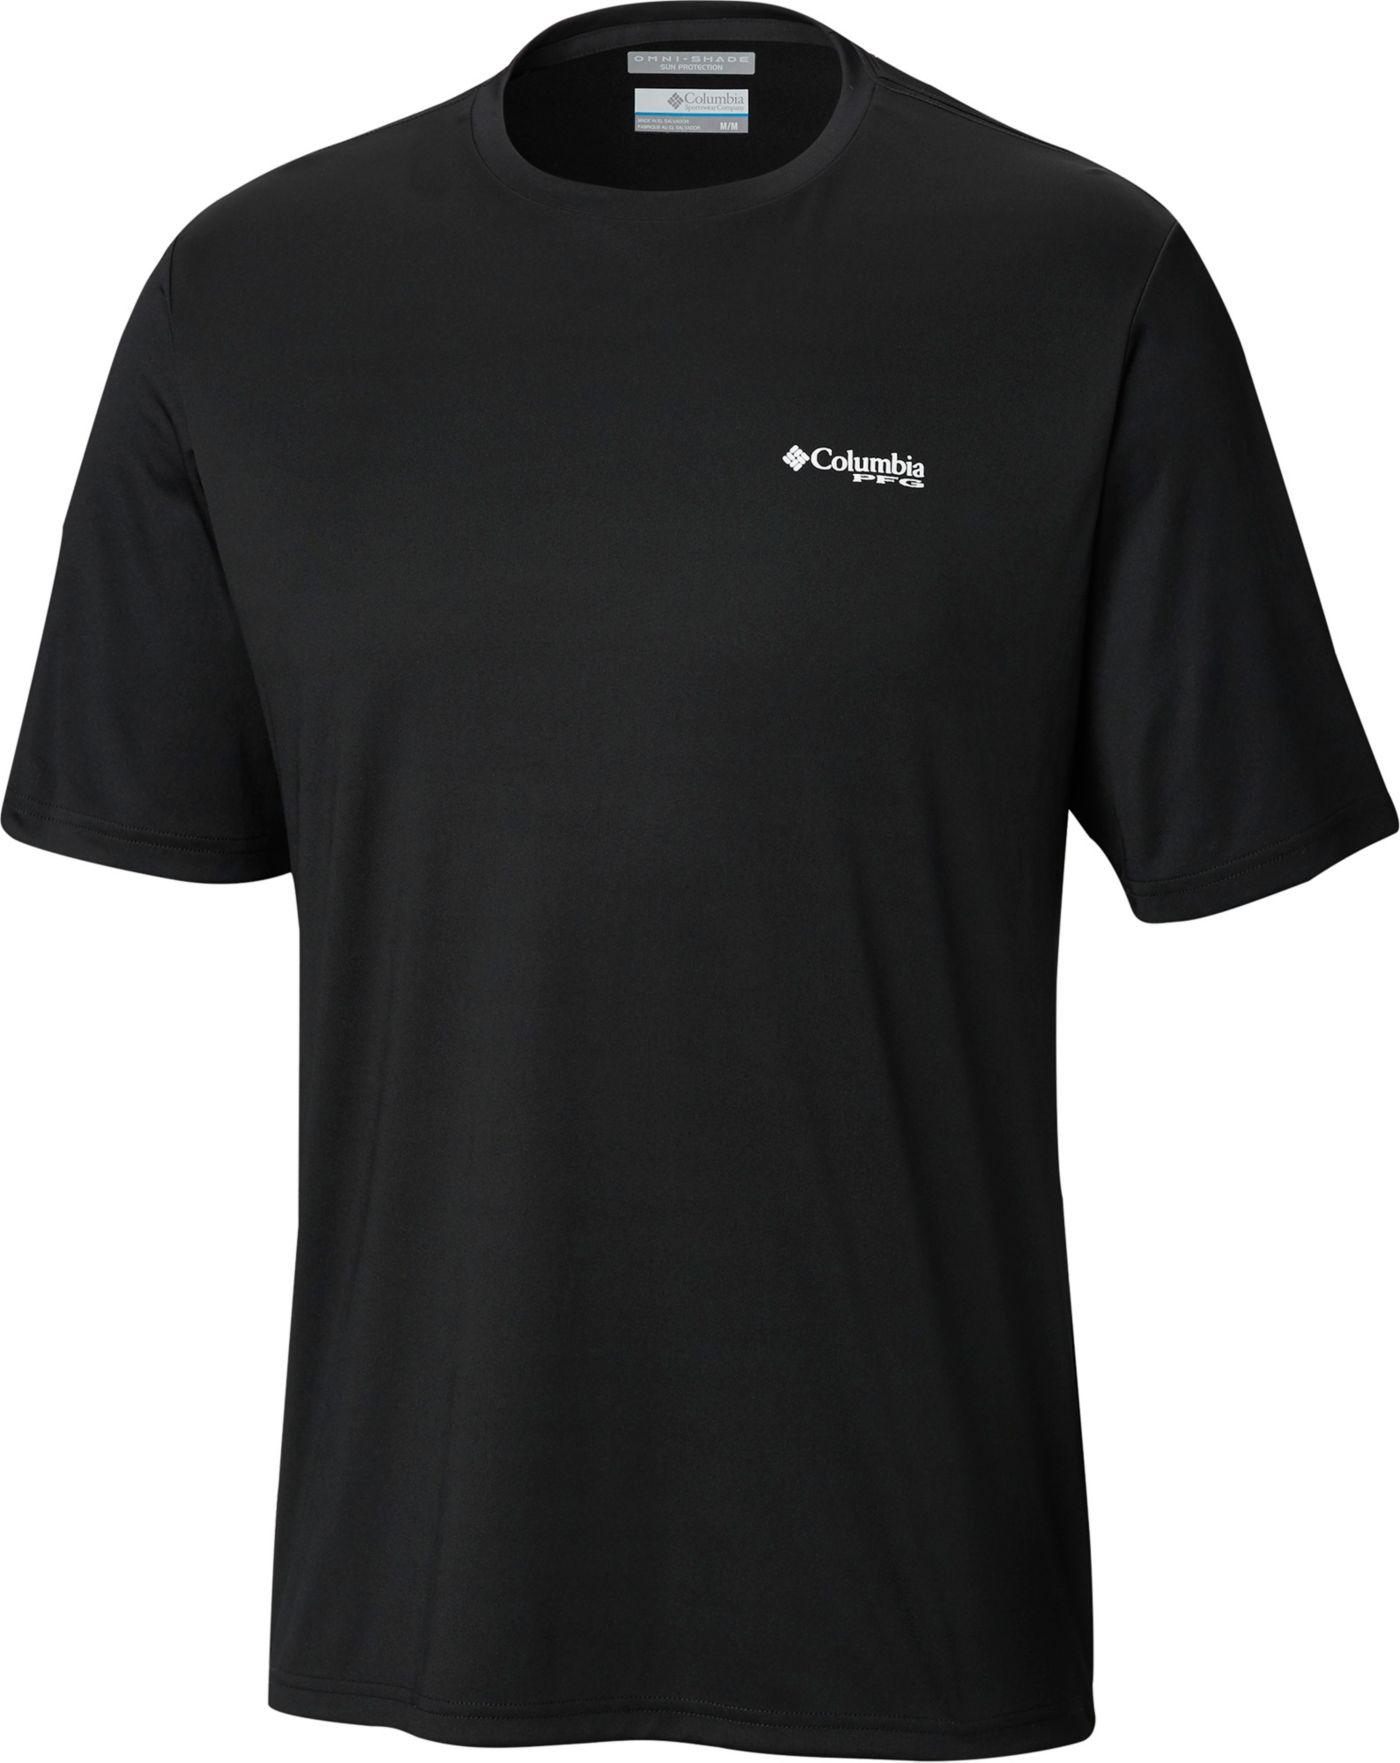 Columbia Men's Terminal Tackle PFG Printed Fish T-Shirt